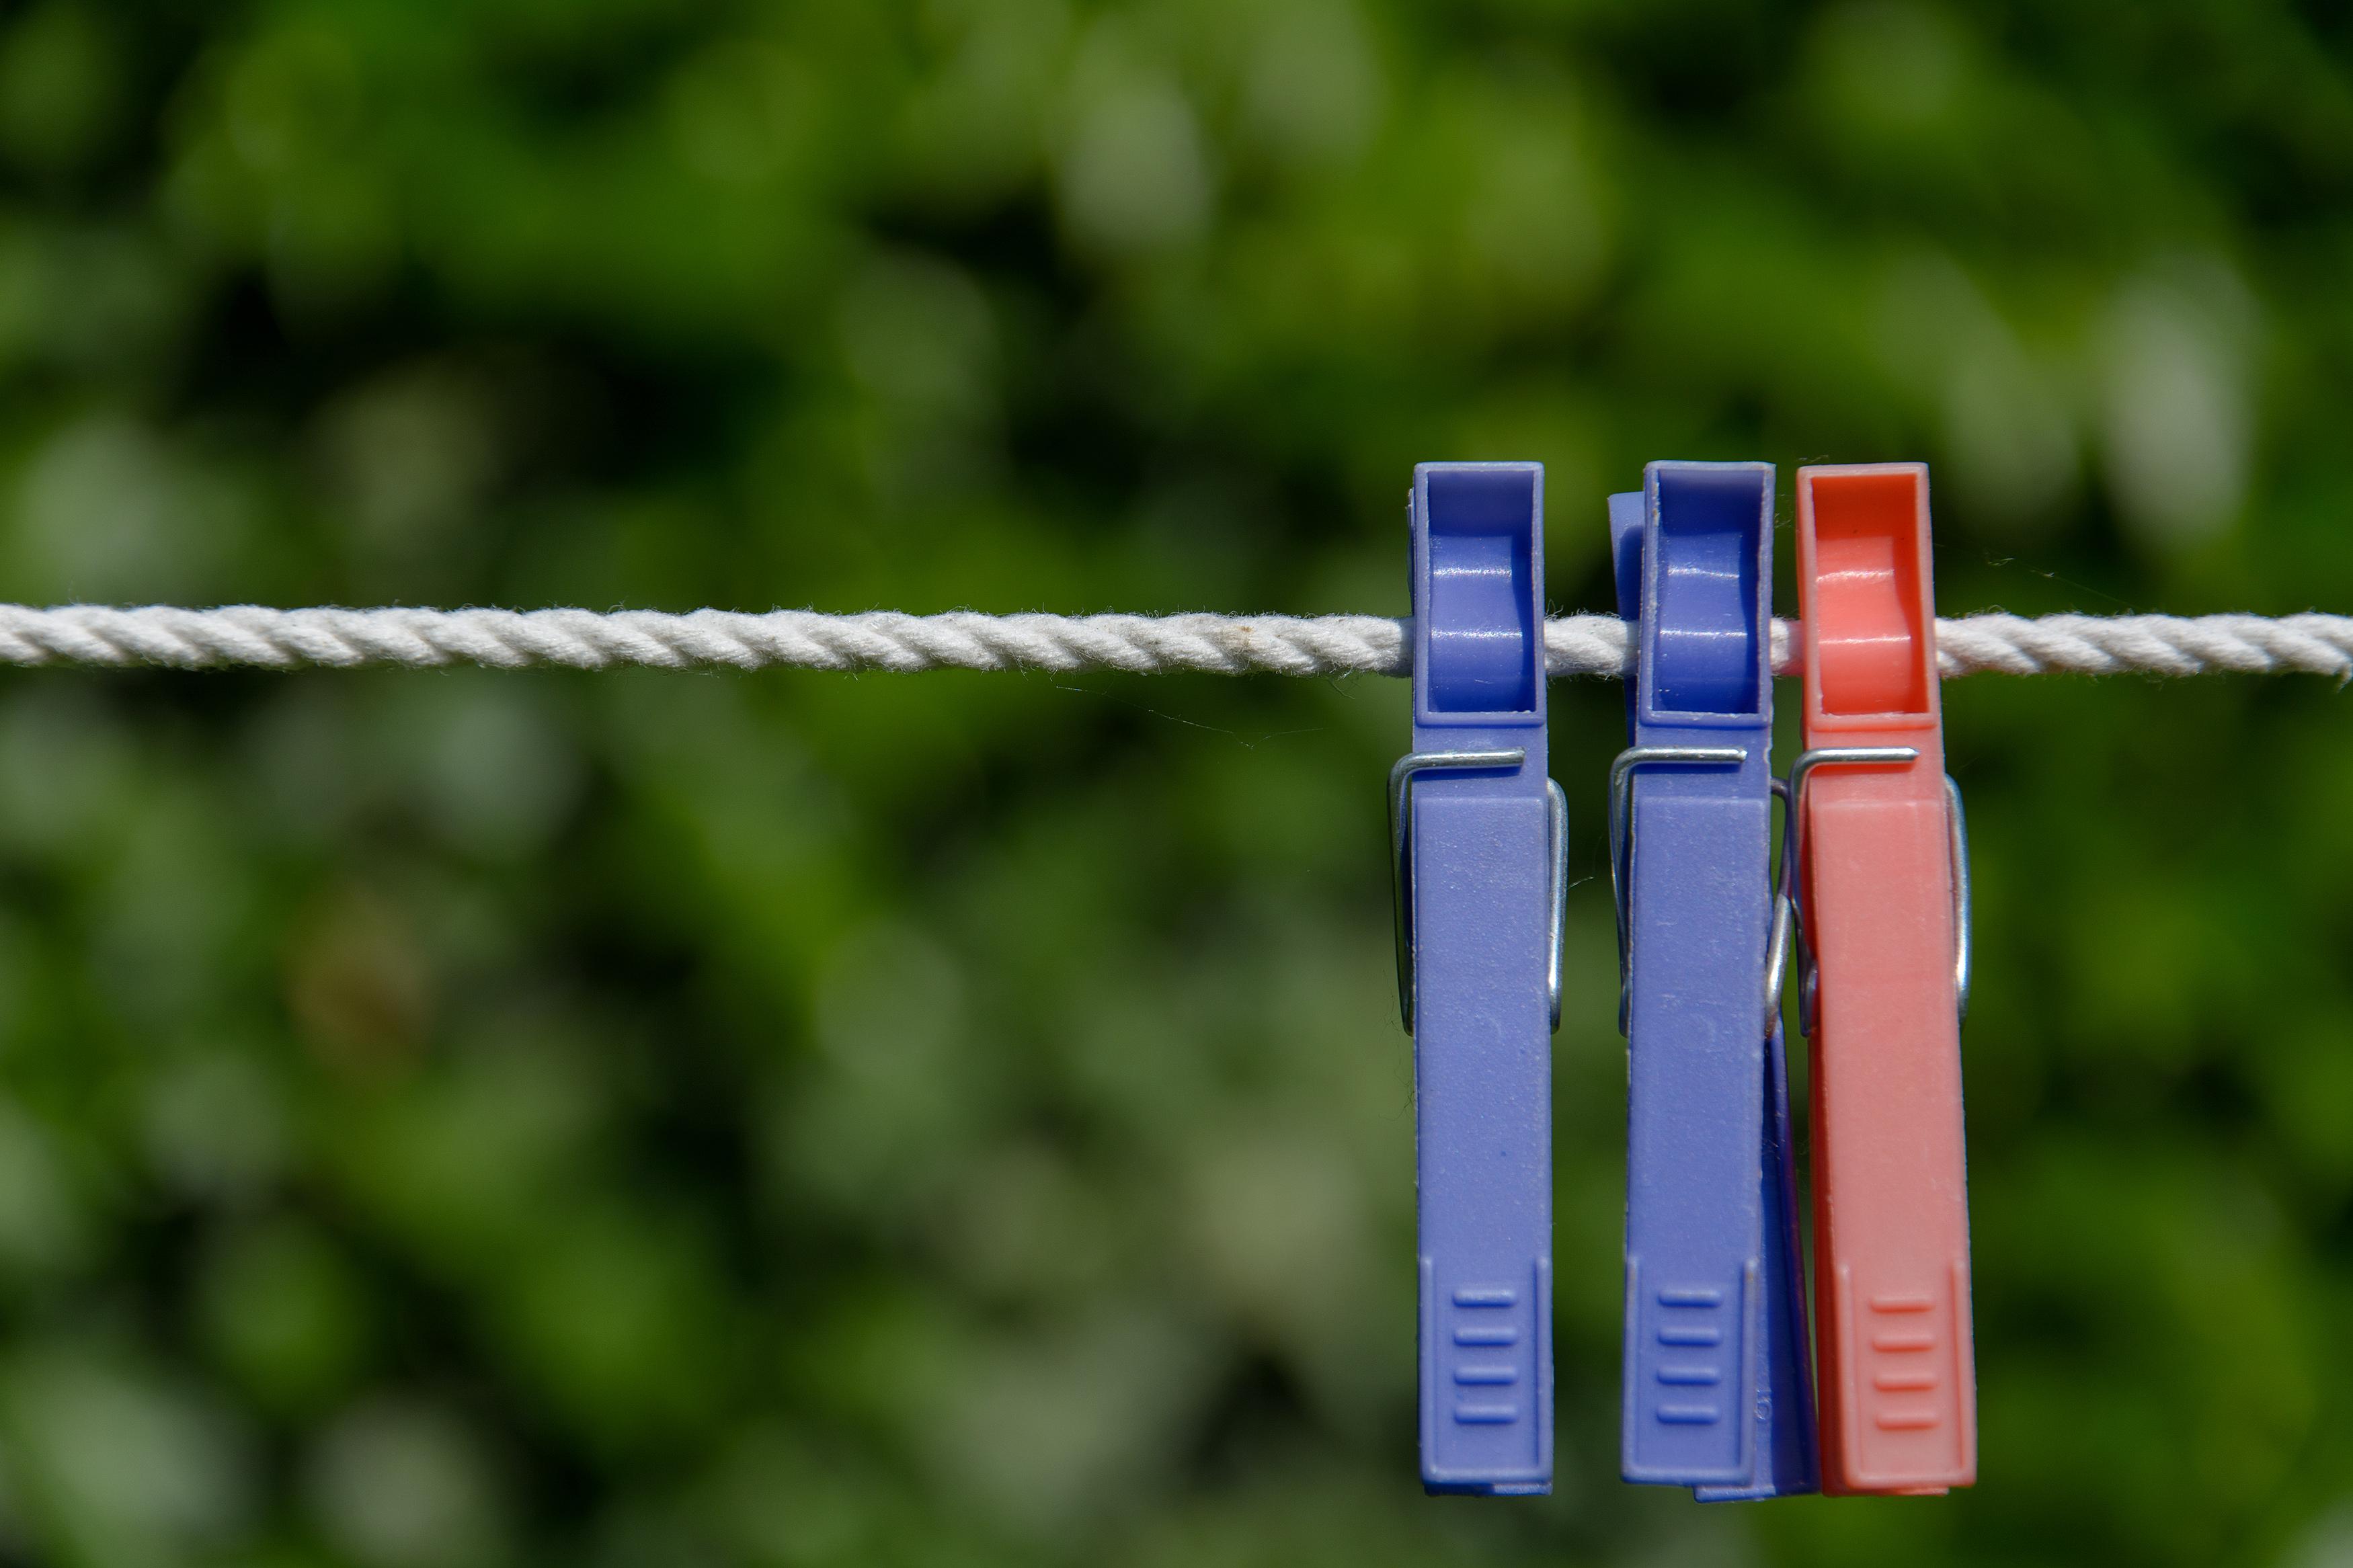 Three Clothespins - FREE image on LibreShot